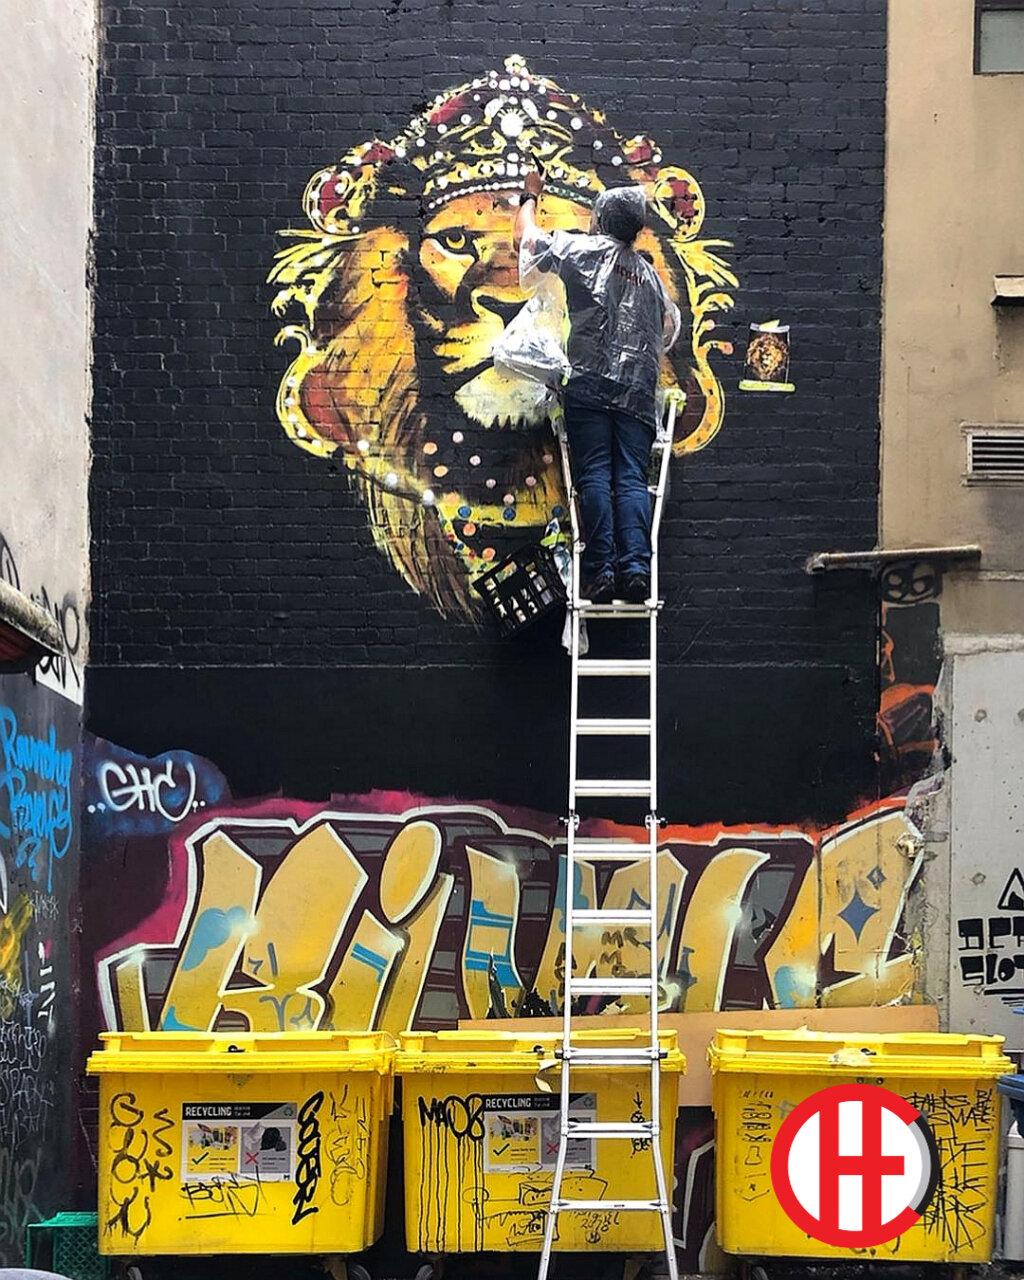 Mural Painters LA mural Artist Muralist Street Artist Wall MURALS Vivache Designs LA.jpg